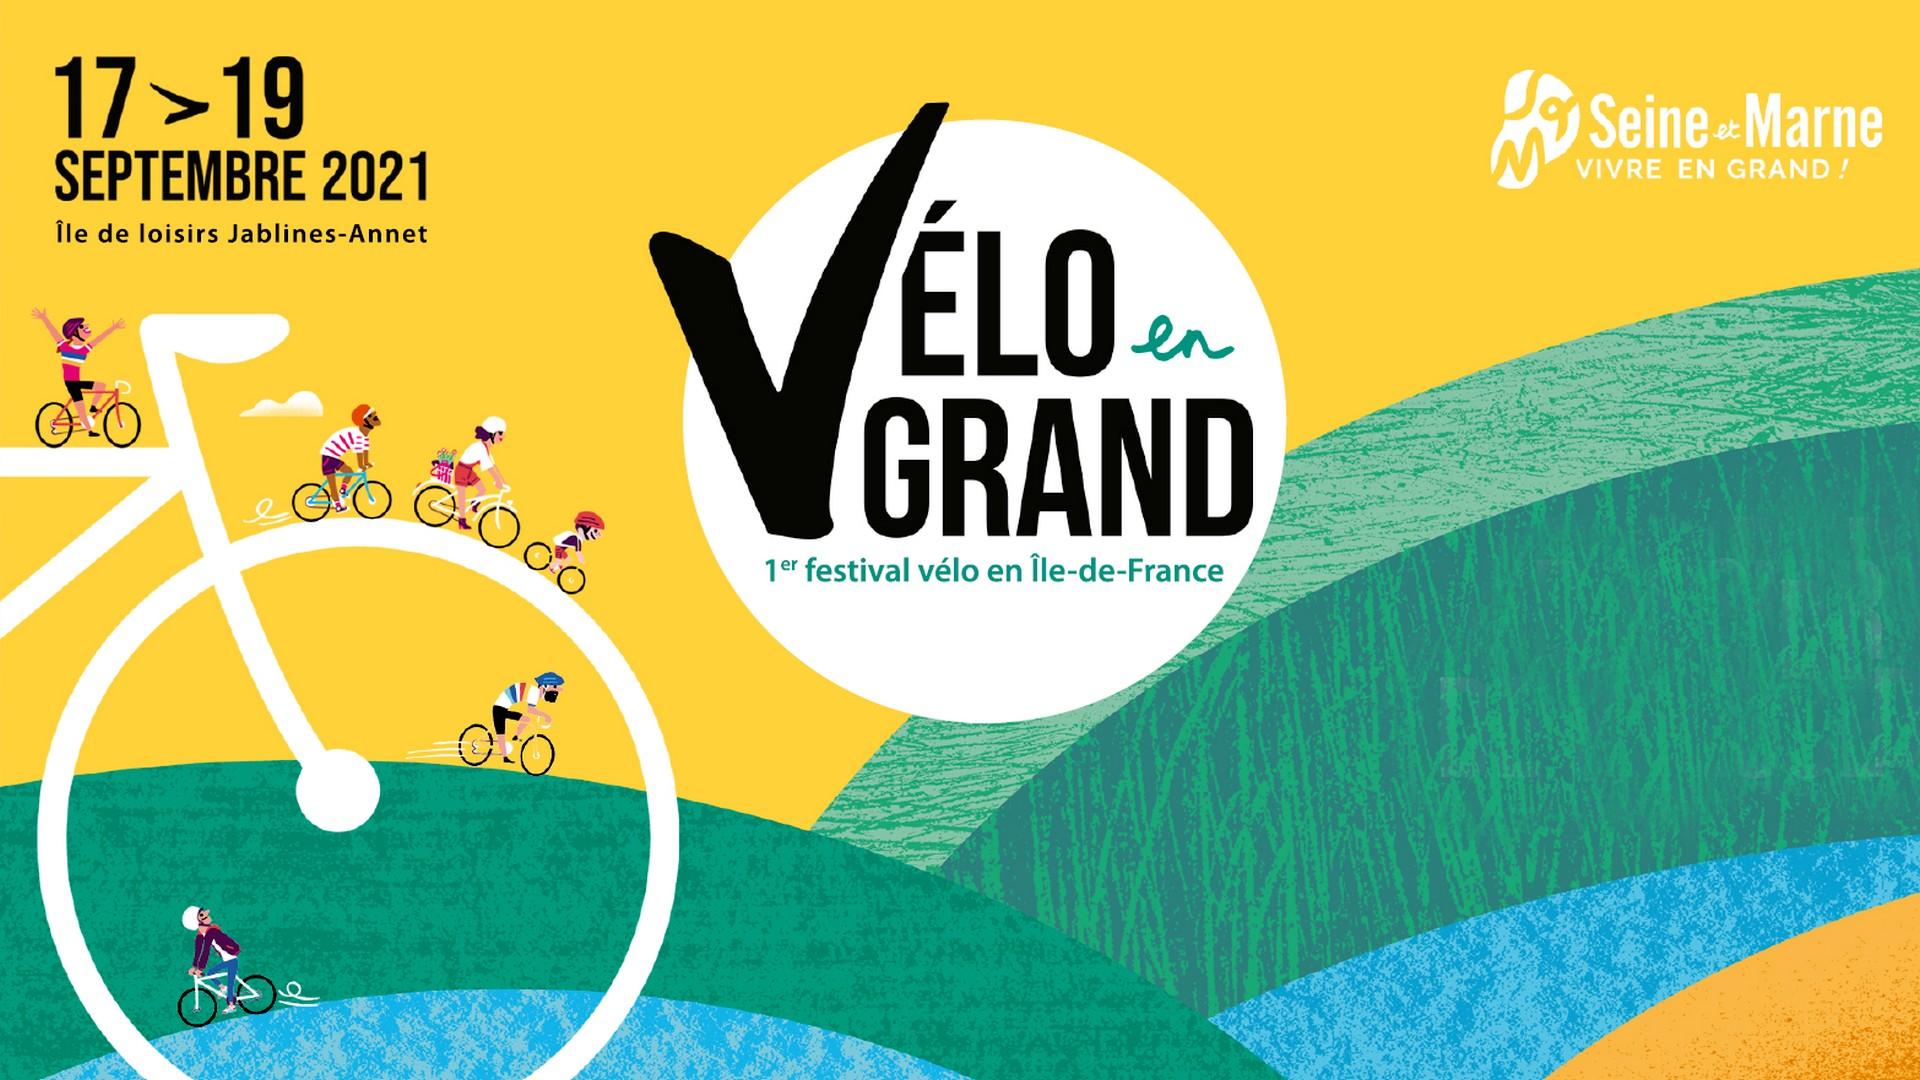 Vélo en Grand 2021 (cyclisme)